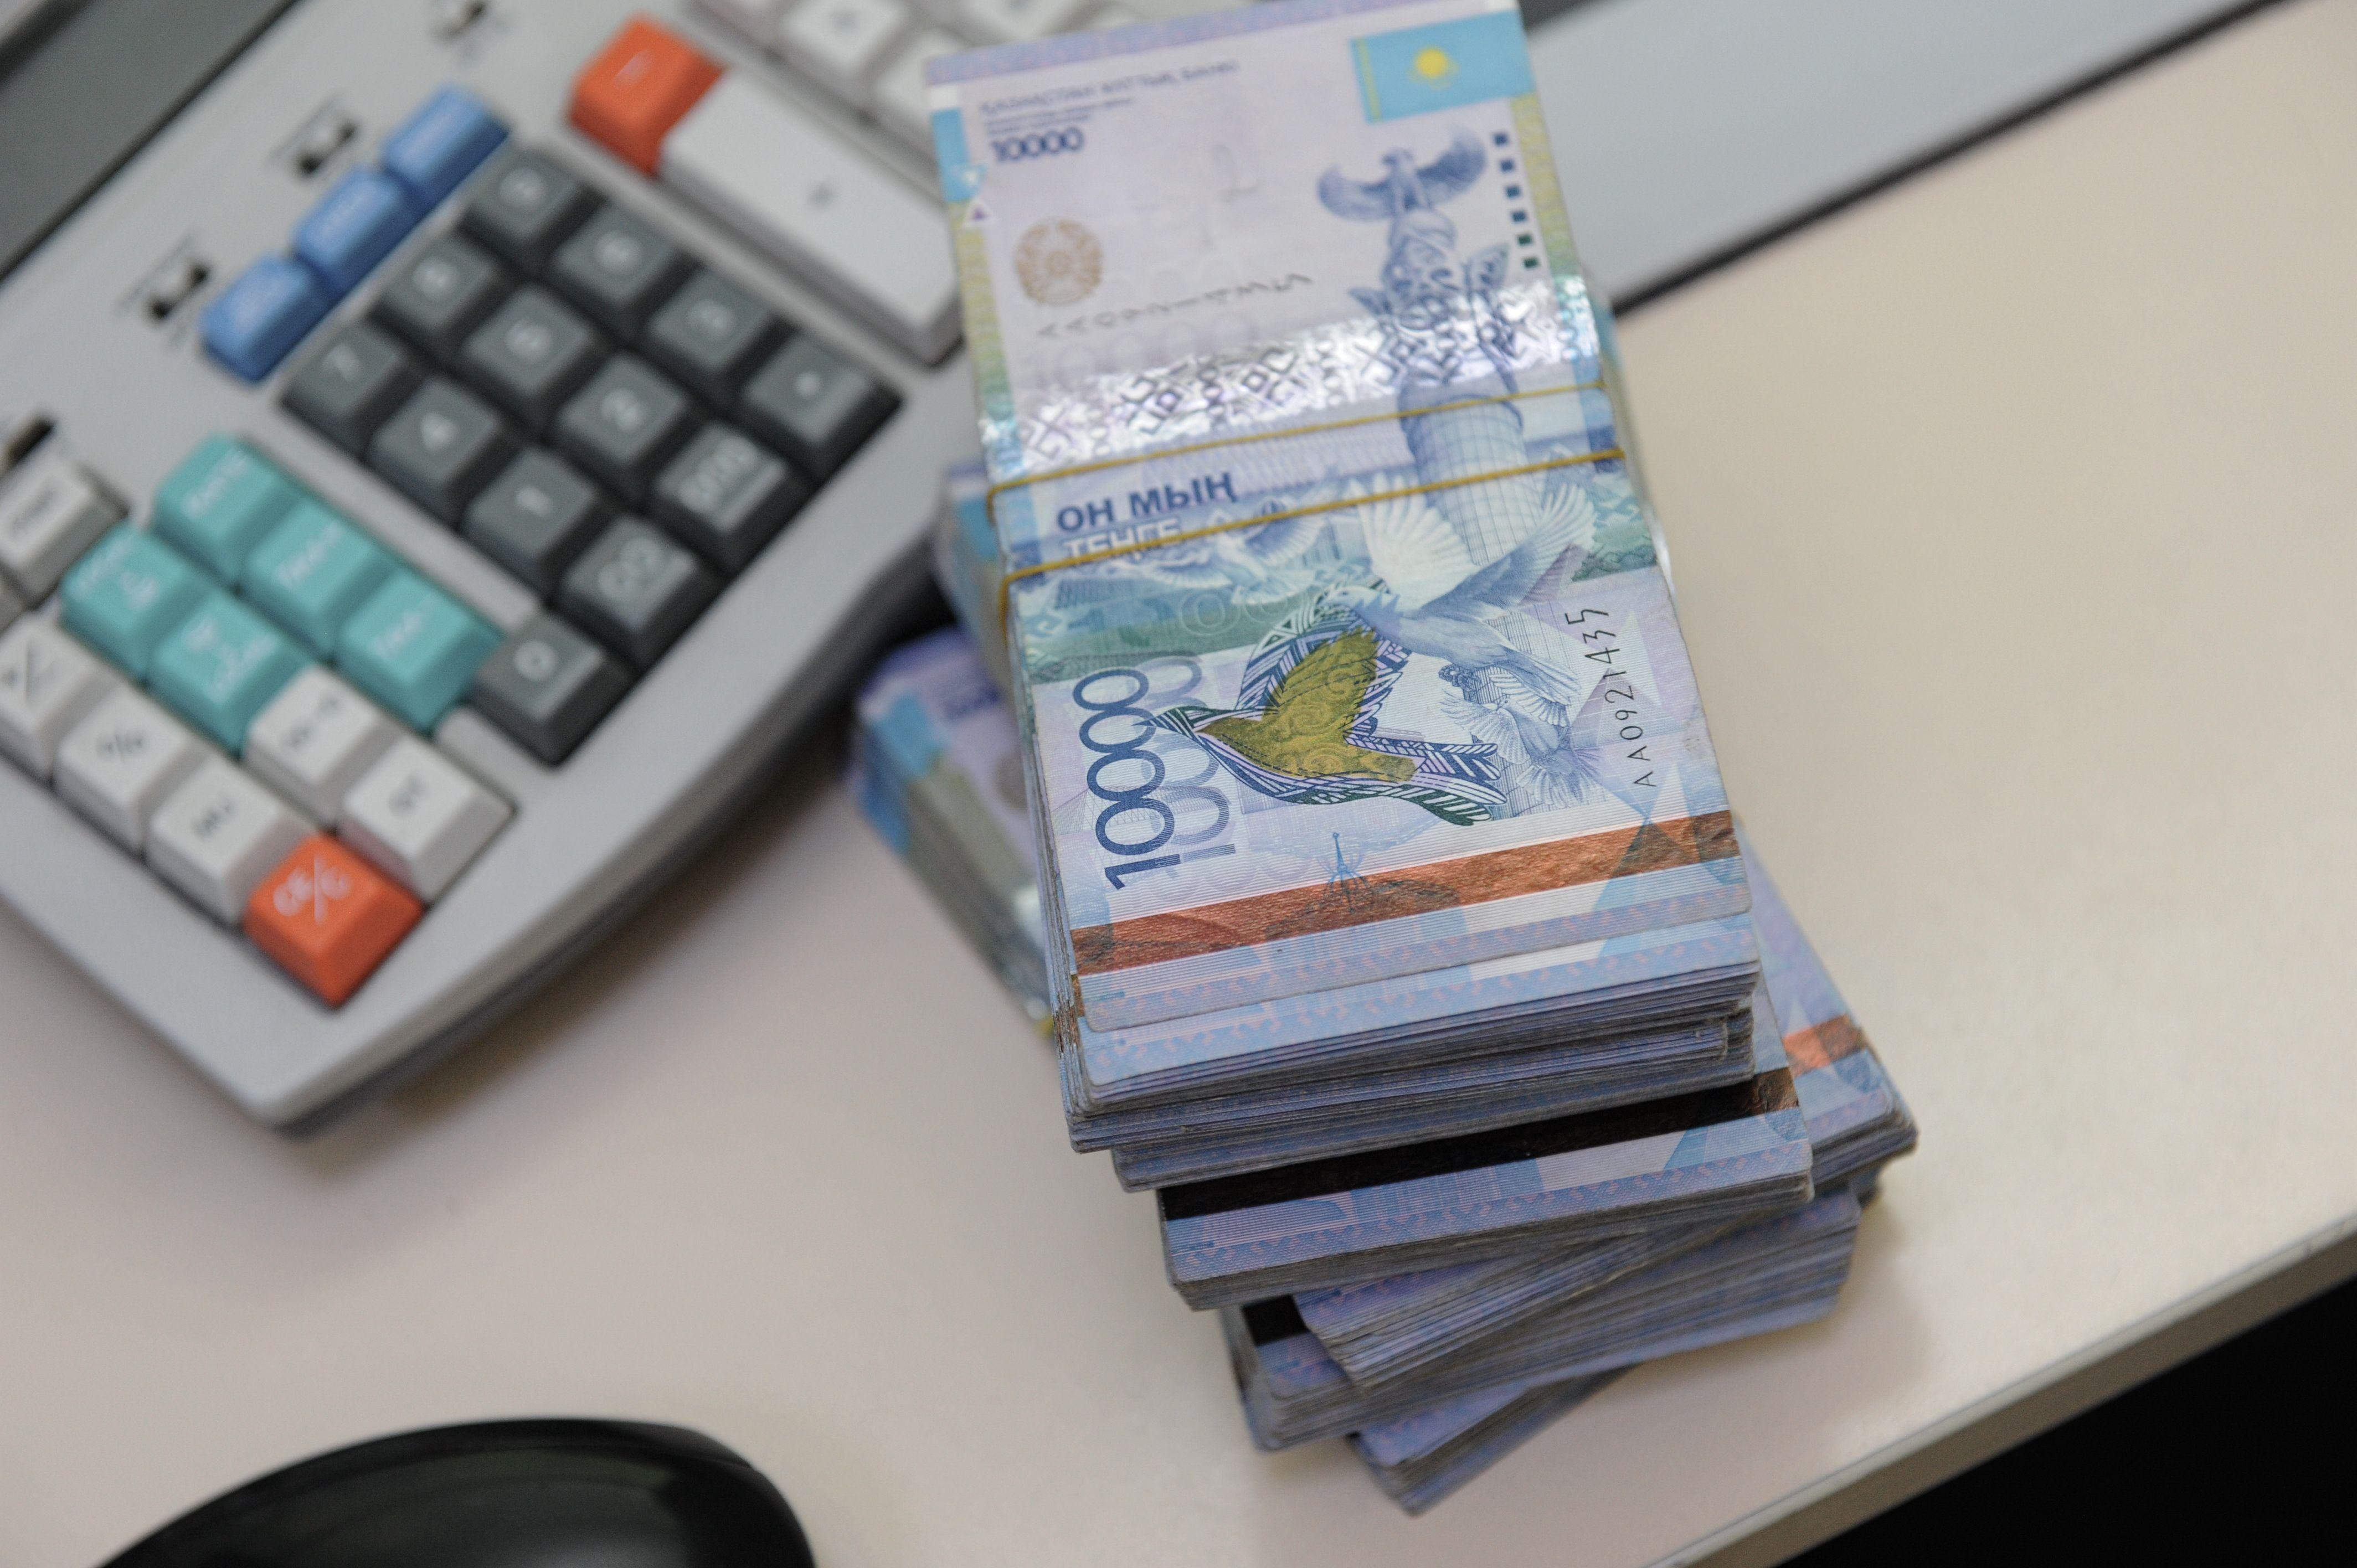 Финансы 89693 - Kapital.kz